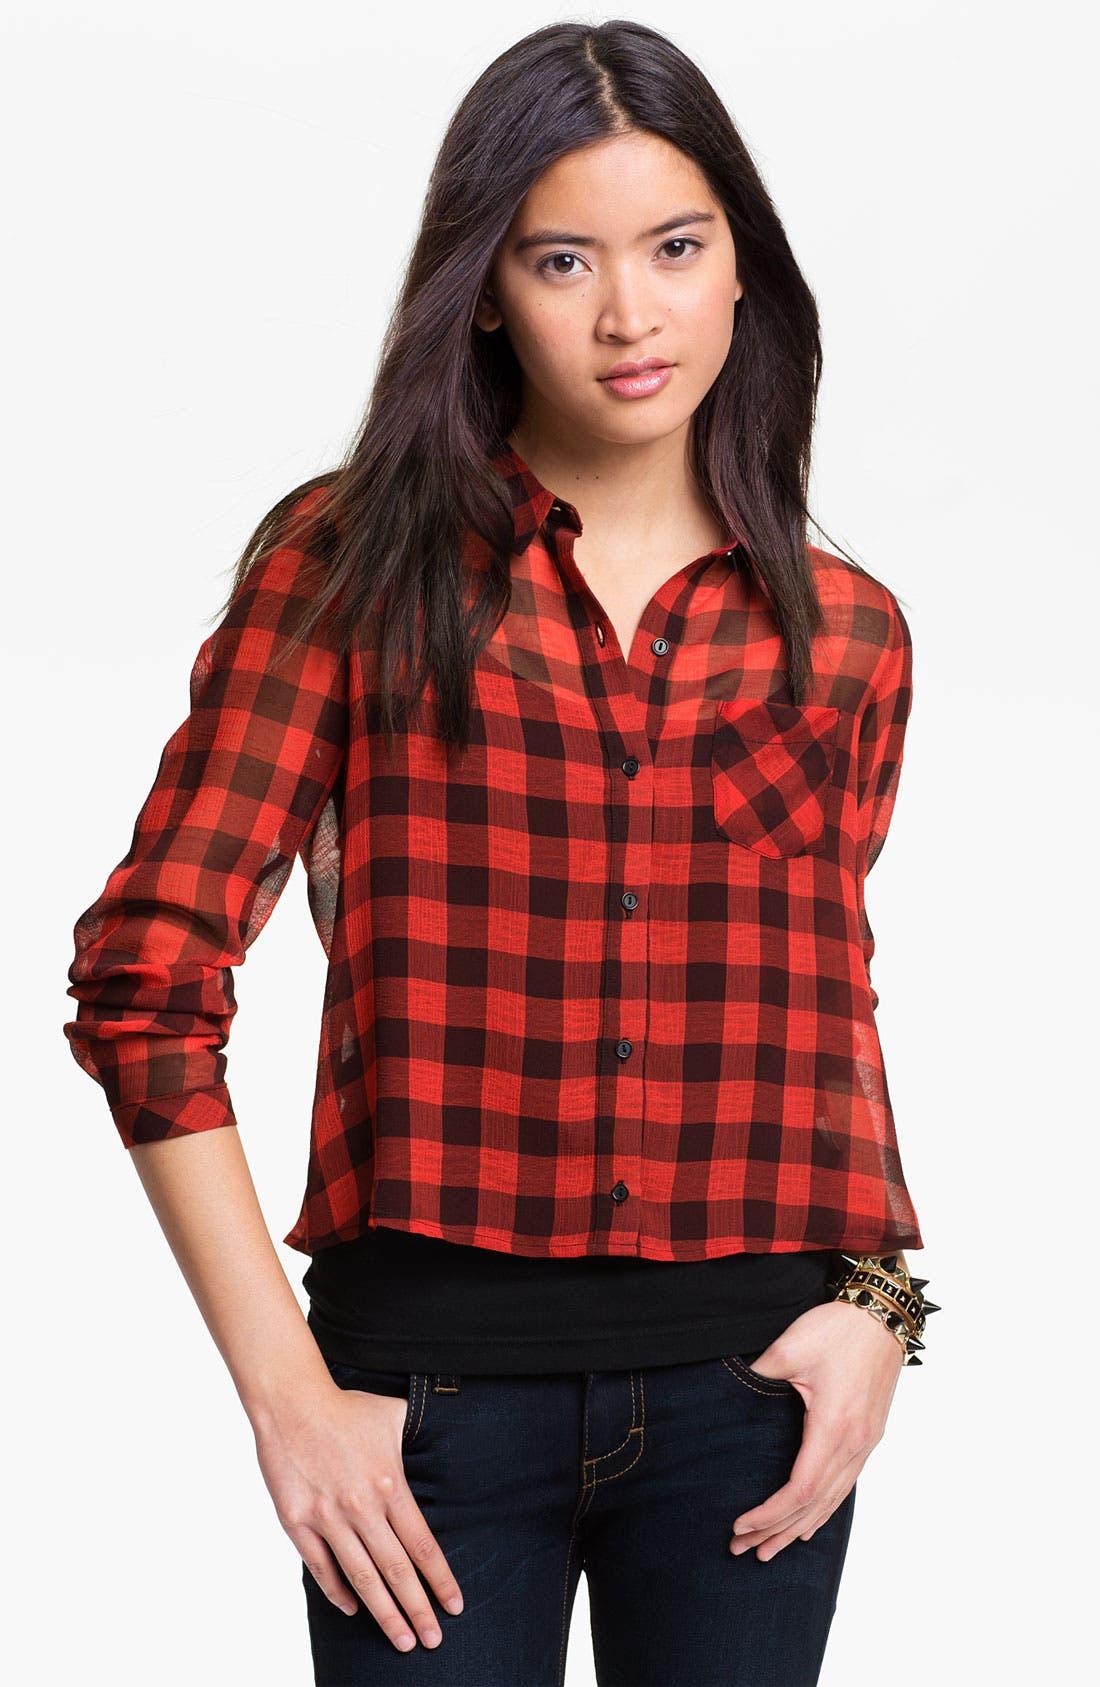 Alternate Image 1 Selected - Elodie Buffalo Plaid Shirt (Juniors)